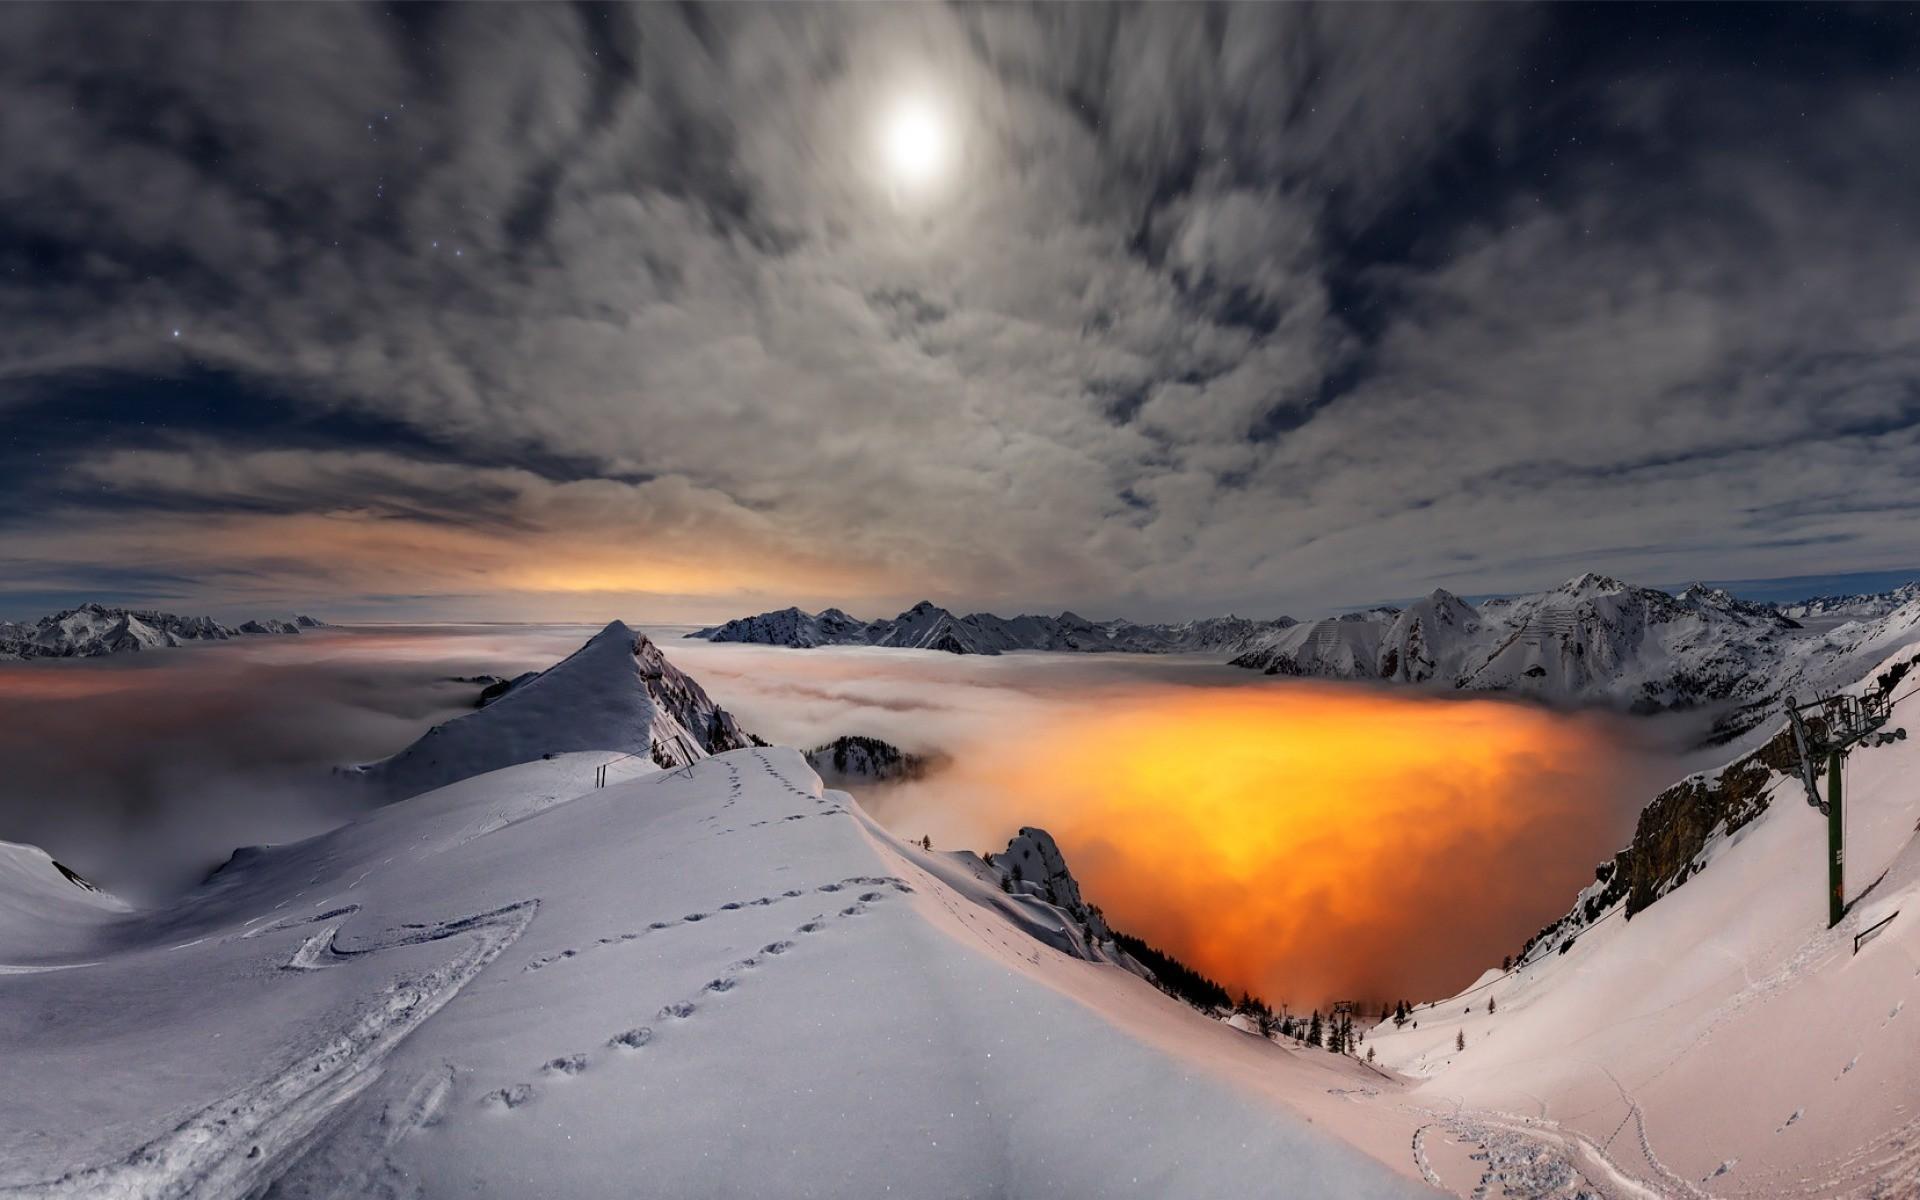 ice mountain, nature, sunset, sky, photo, landscape, hd wallpaper